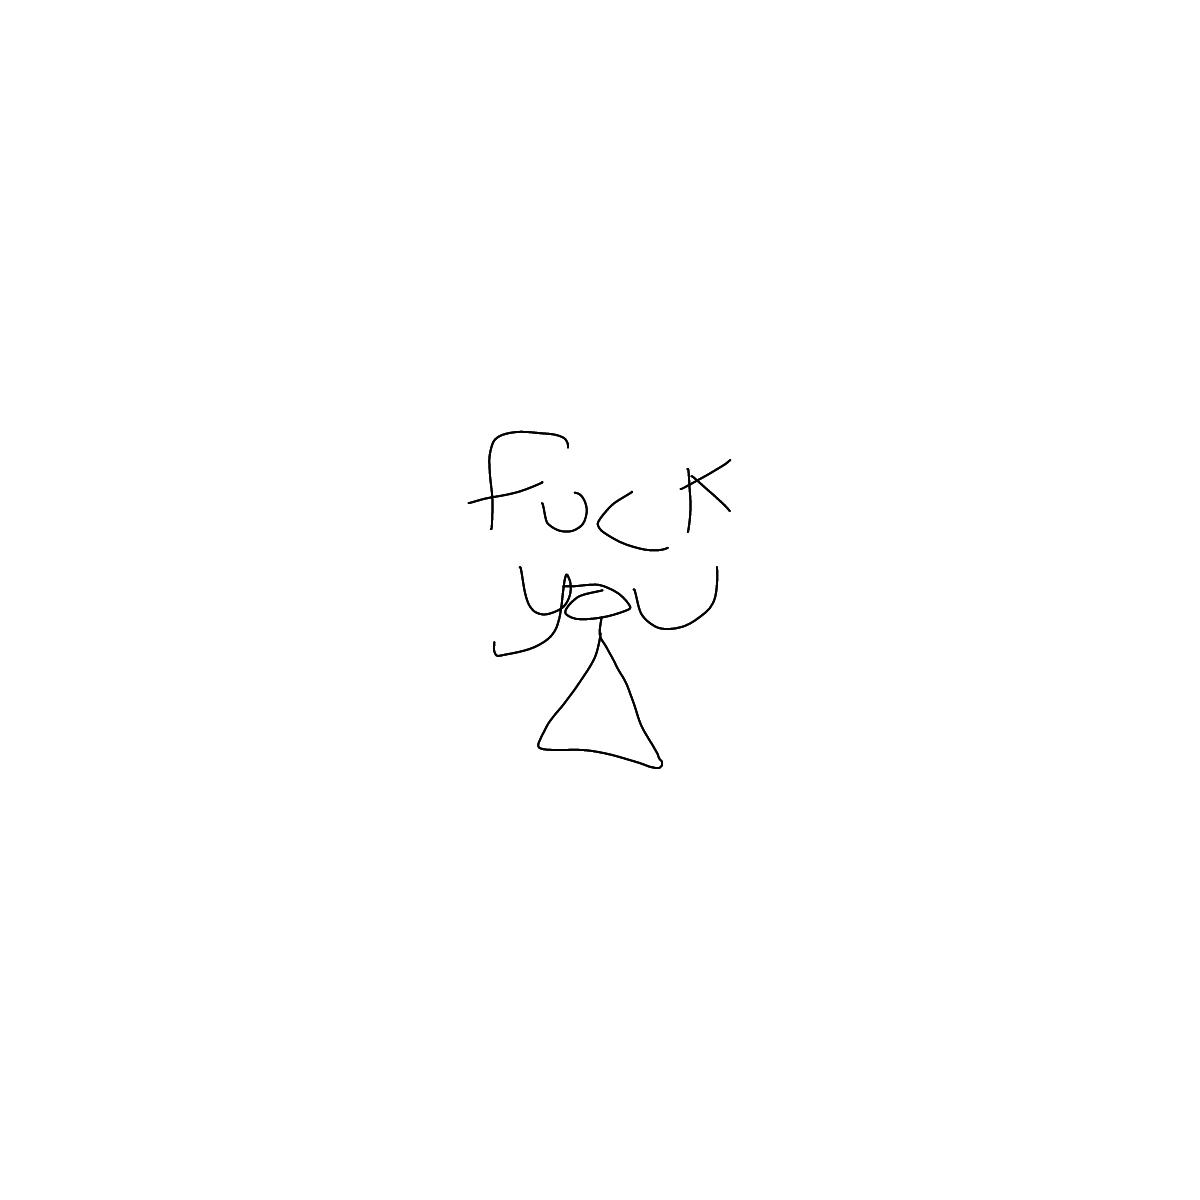 BAAAM drawing#15394 lat:50.2554397583007800lng: 15.2589435577392580